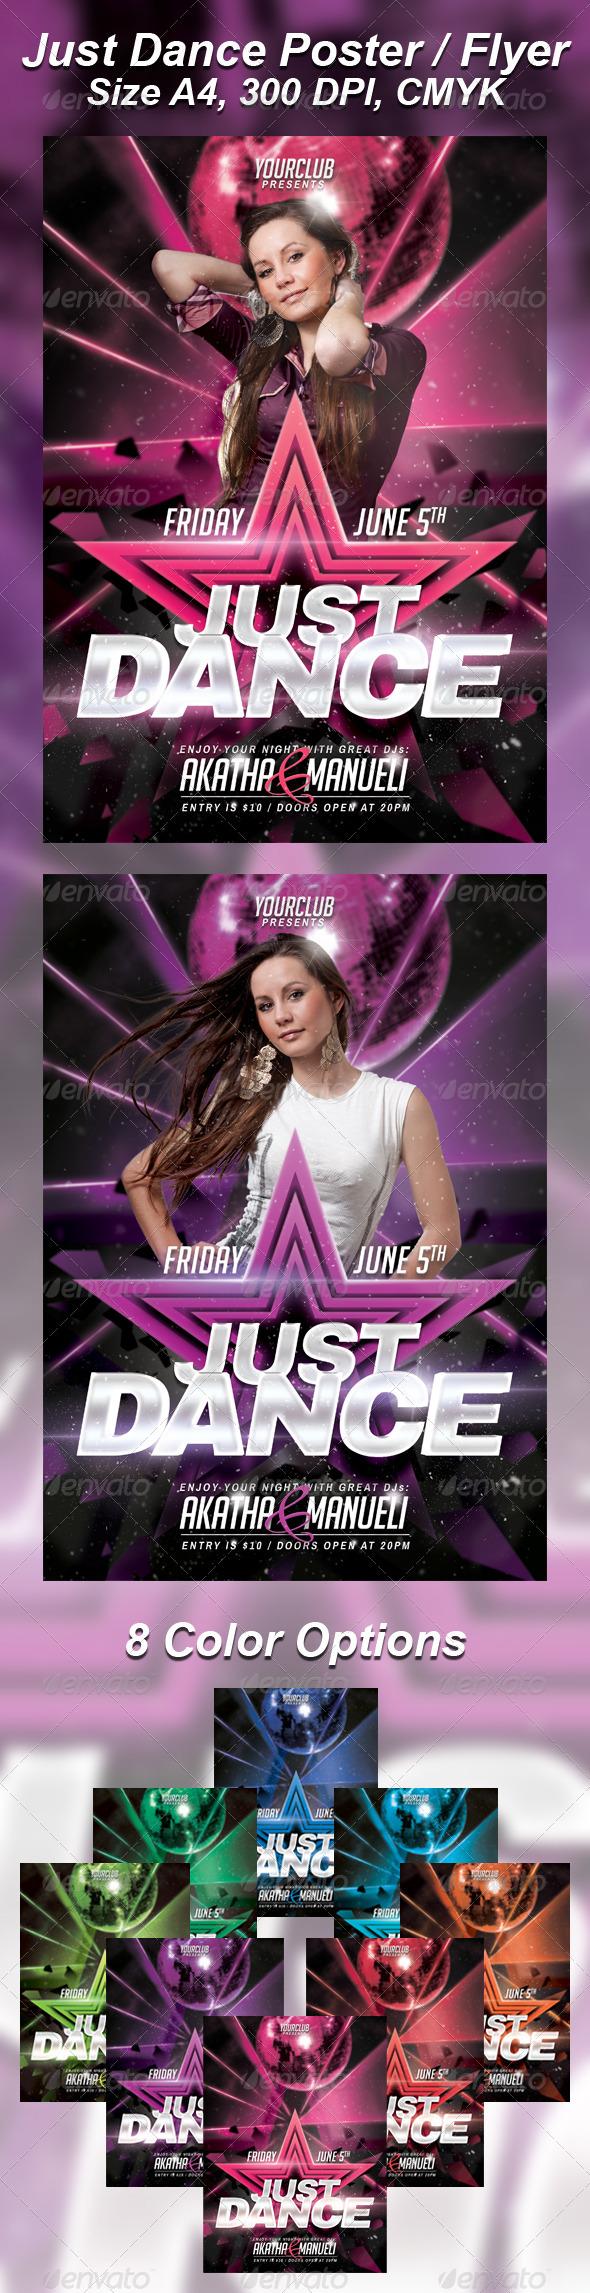 A4 Just Dance Party Club Flyer 8in1 by Ondrejvasak